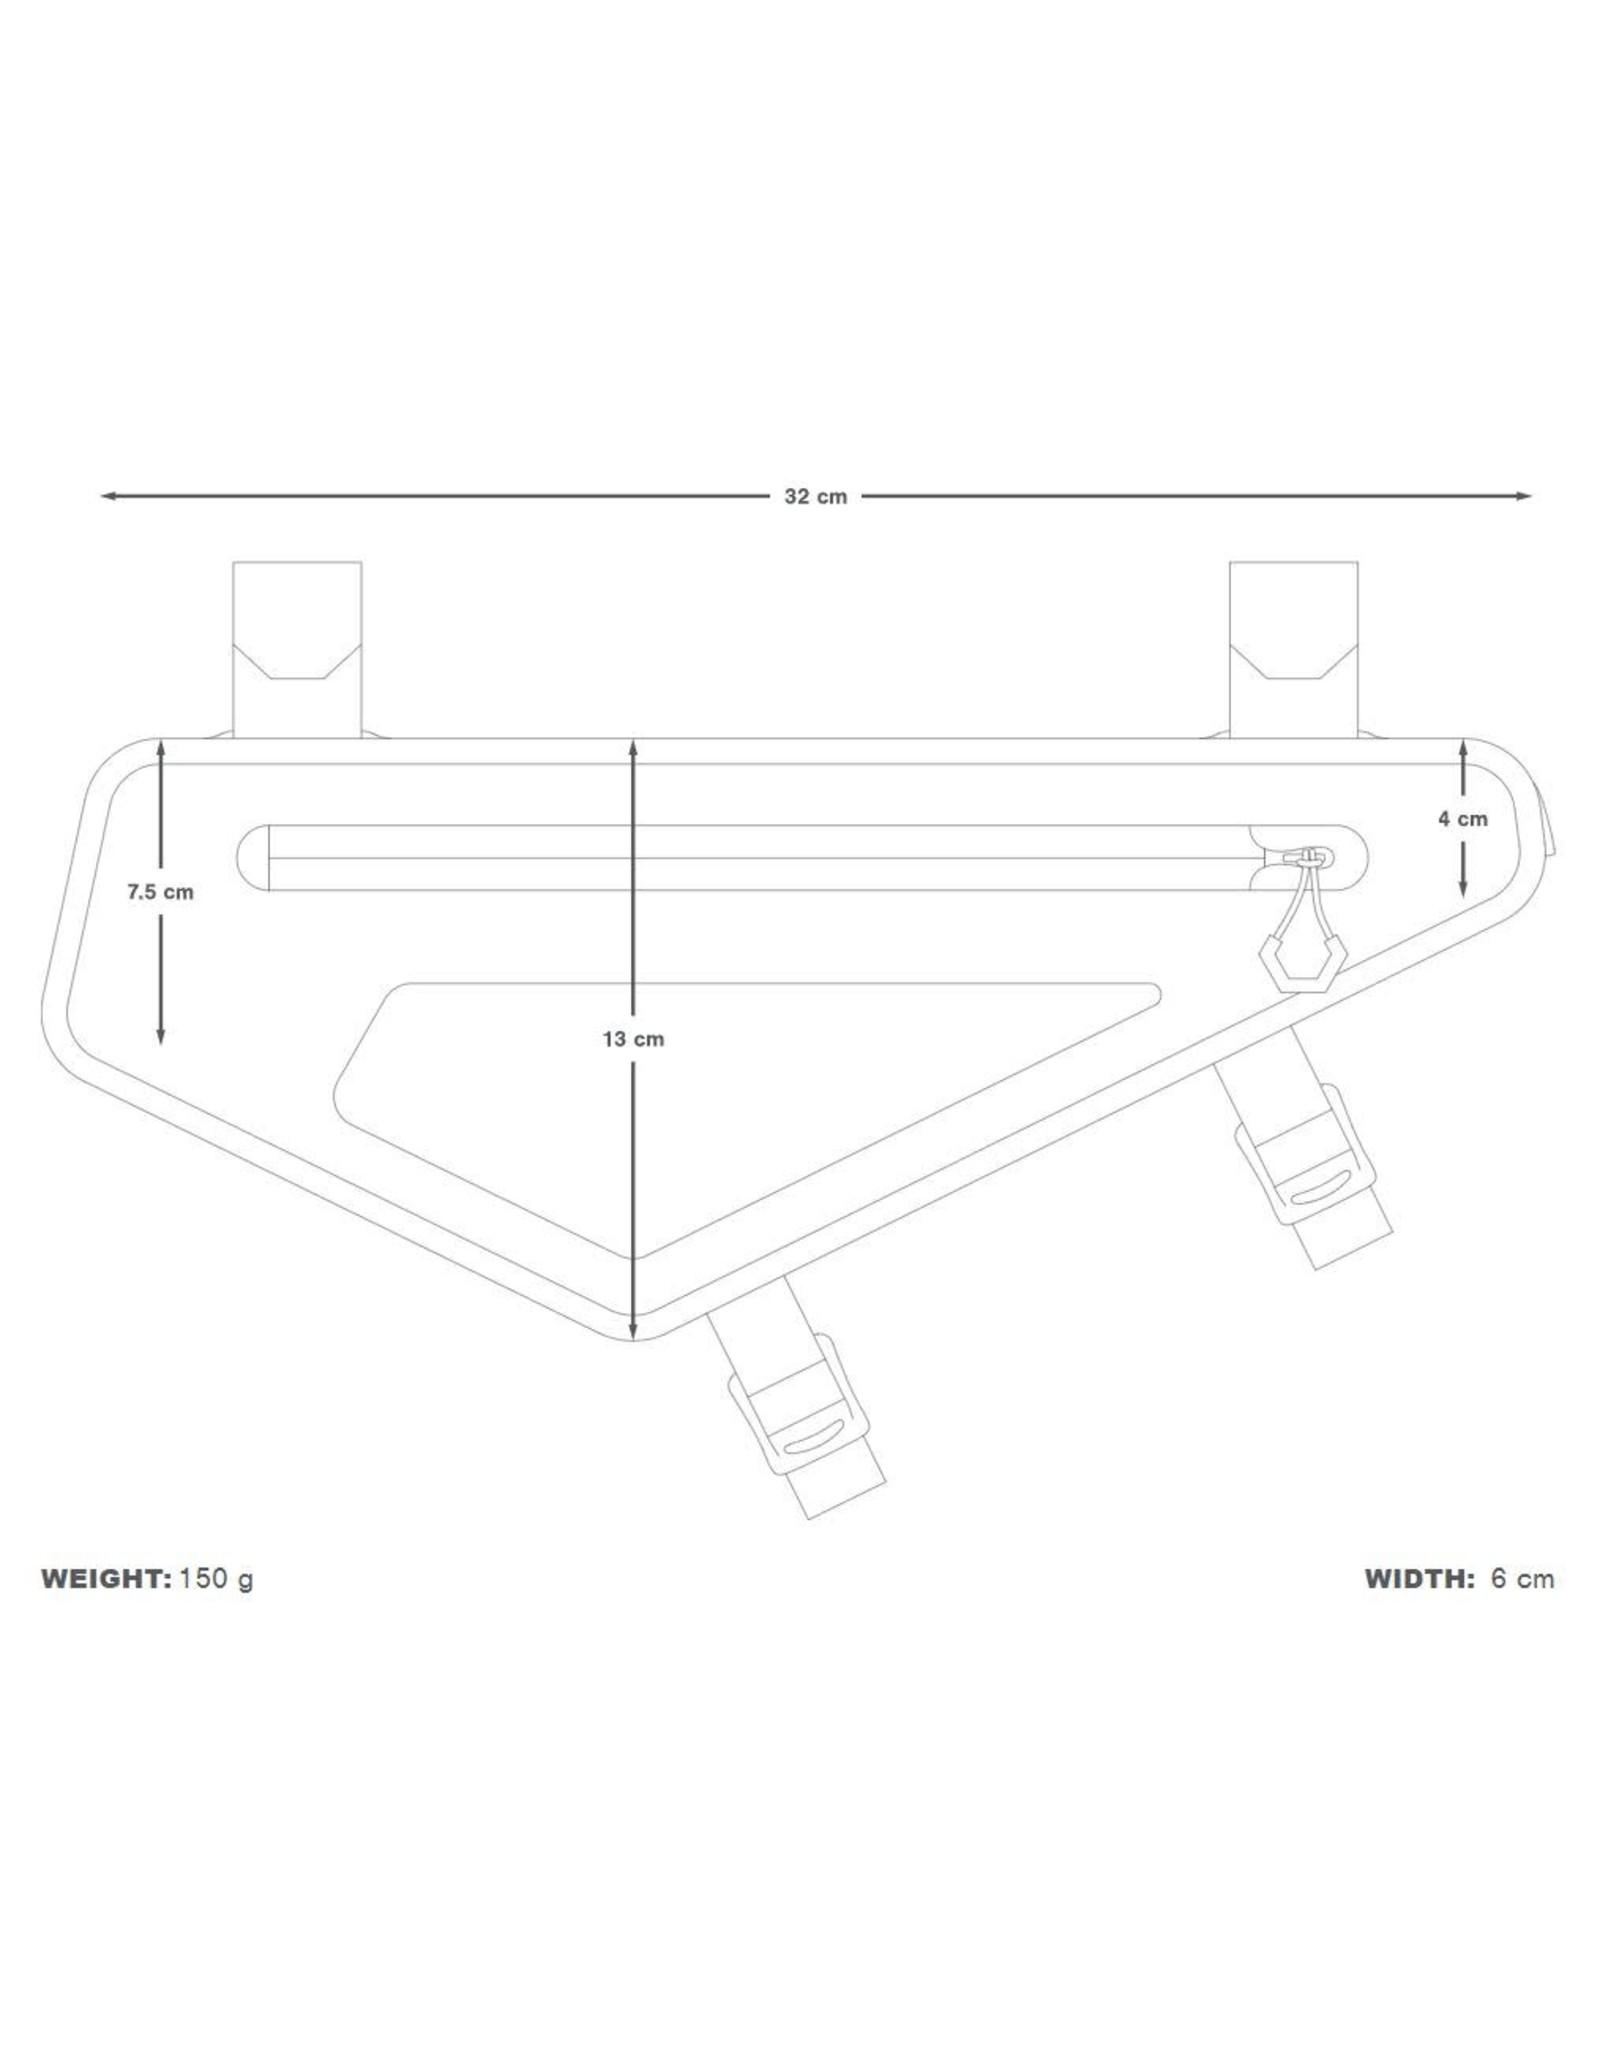 Apidura APIDURA, Backcountry Frame Pack, 2L